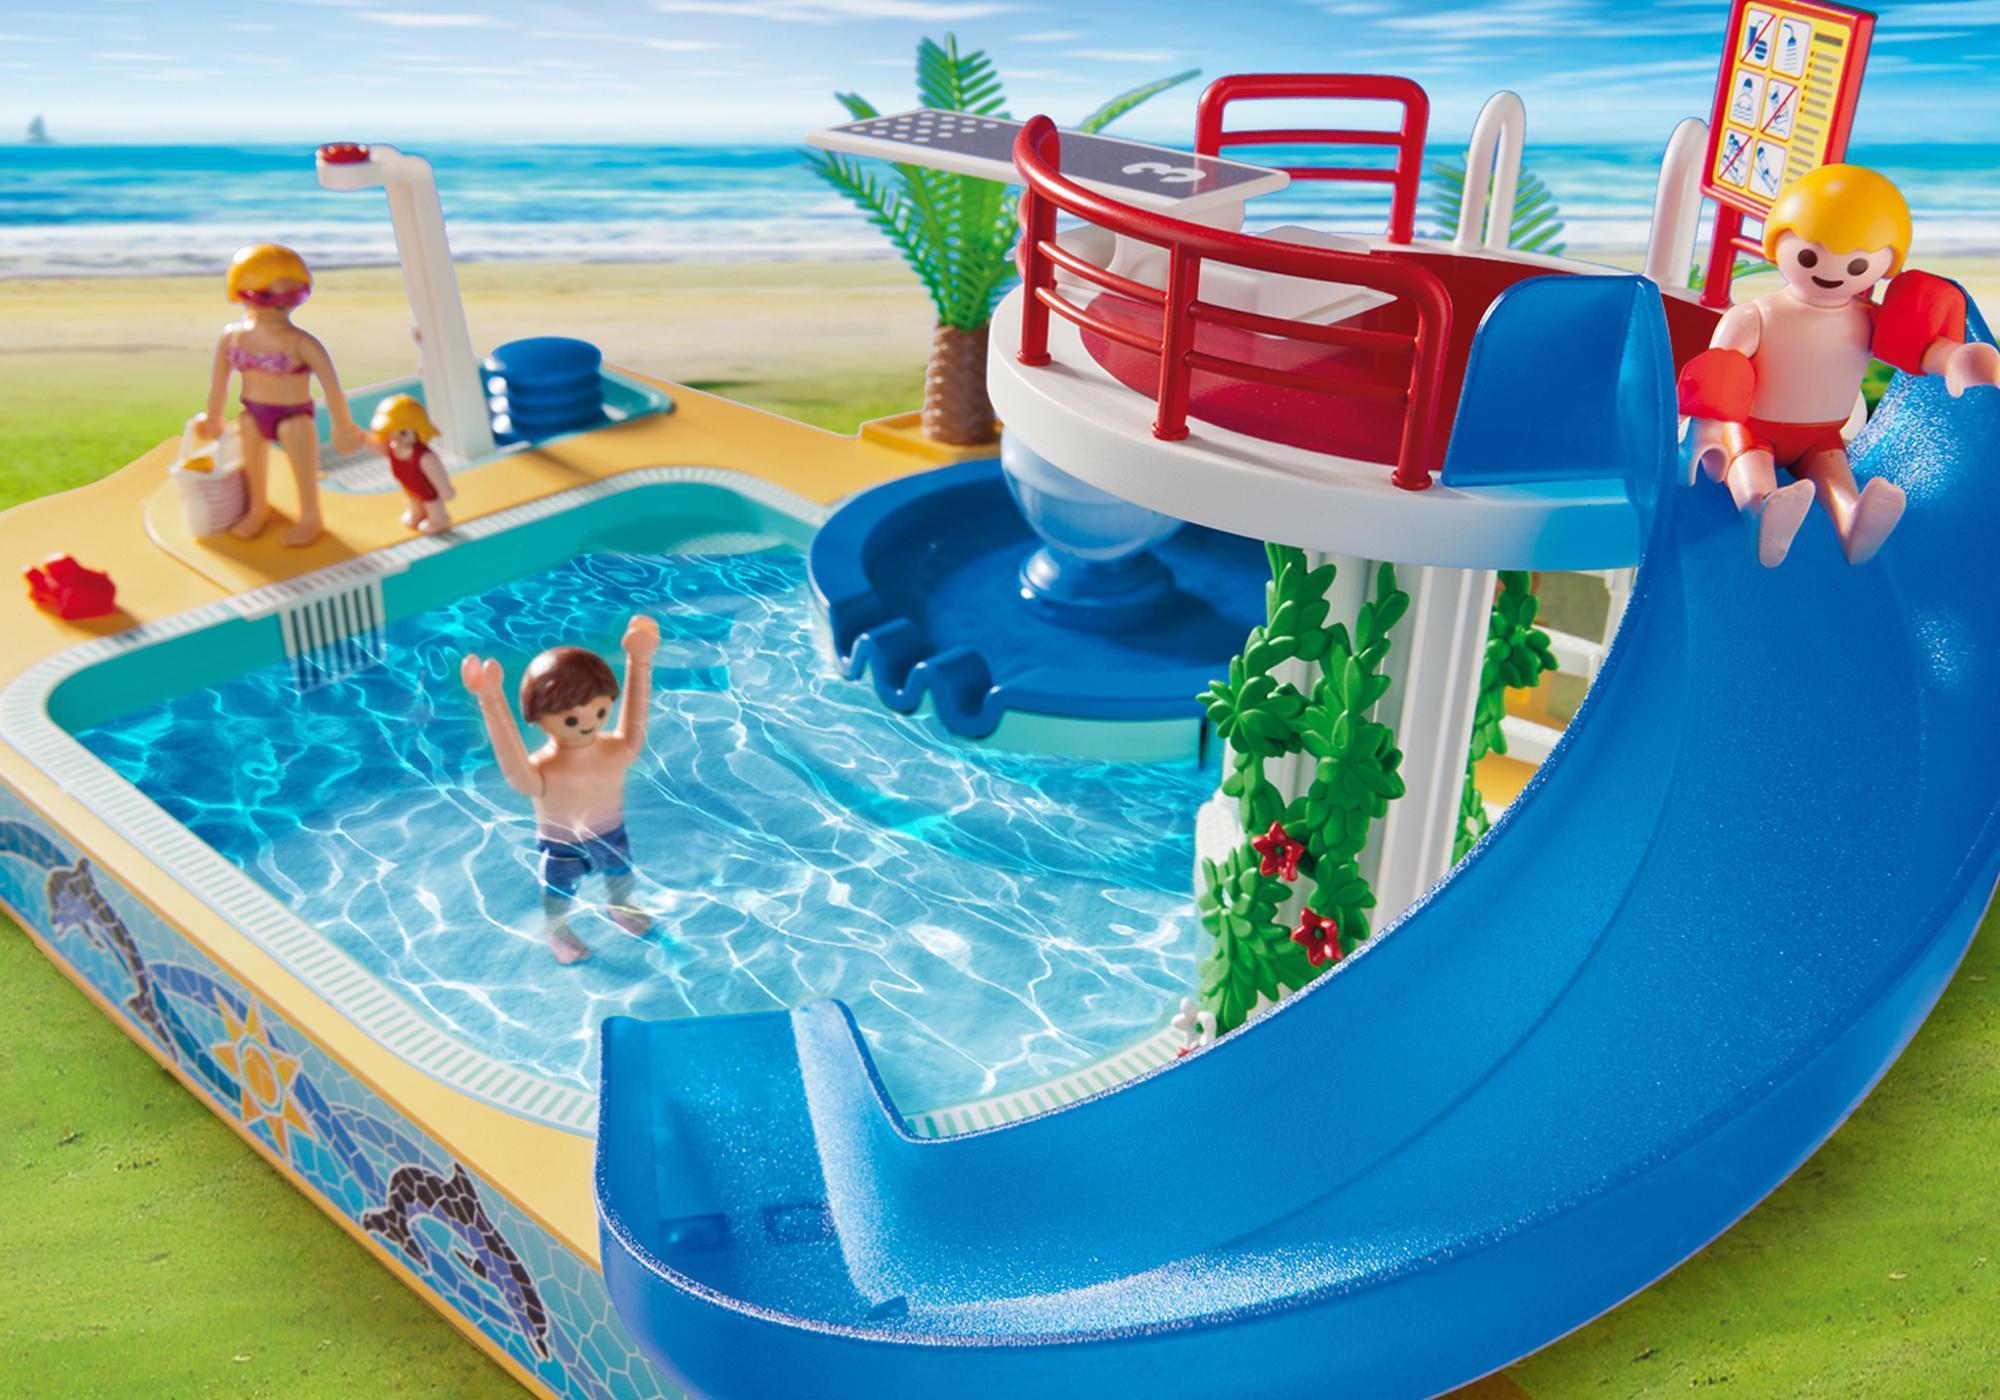 http://media.playmobil.com/i/playmobil/5433_product_extra1